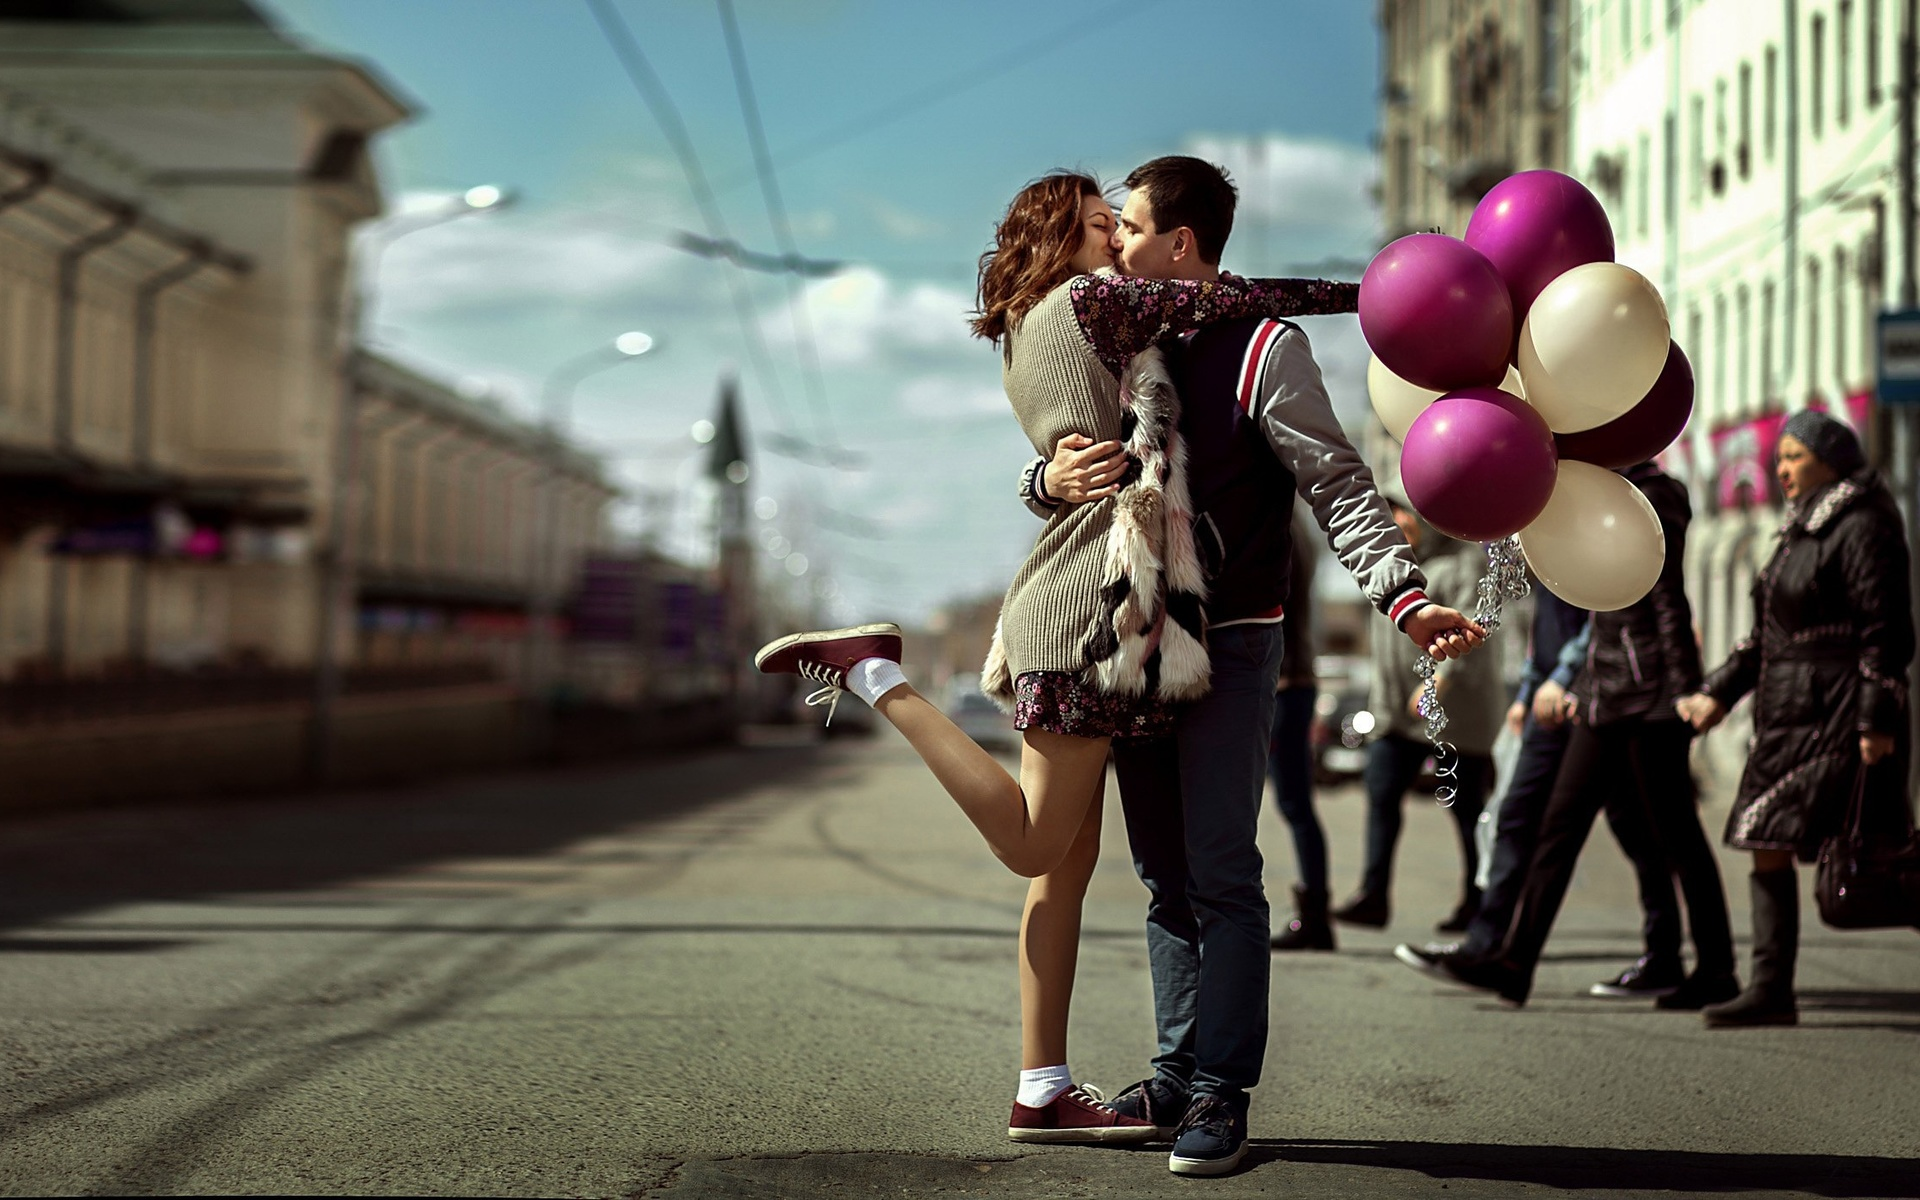 Картинки пар в городе